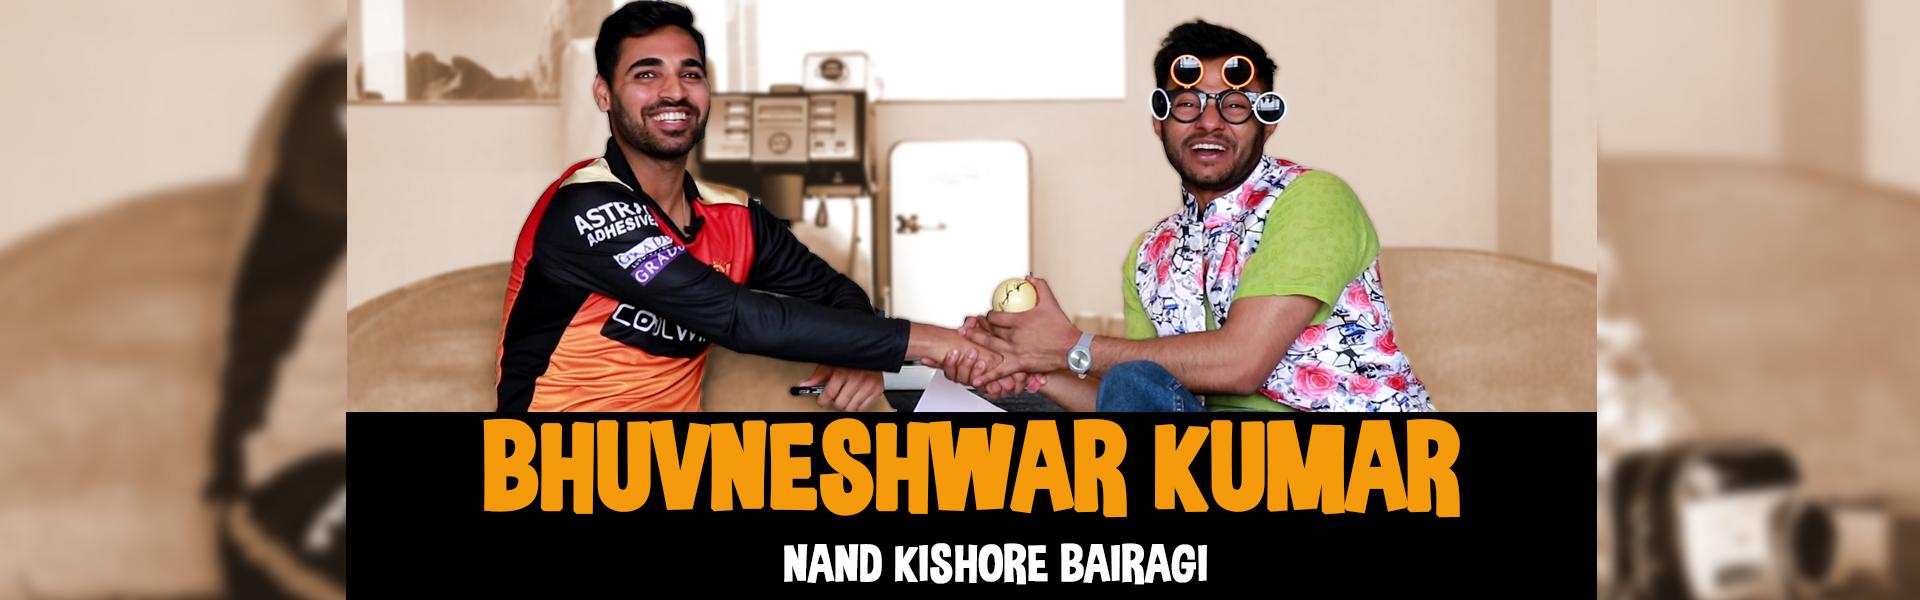 Bhuvneshwar Kumar | Nand Kishore Bairagi | RJ Kisna | Sunrisers Hyderabad | IPL 2019